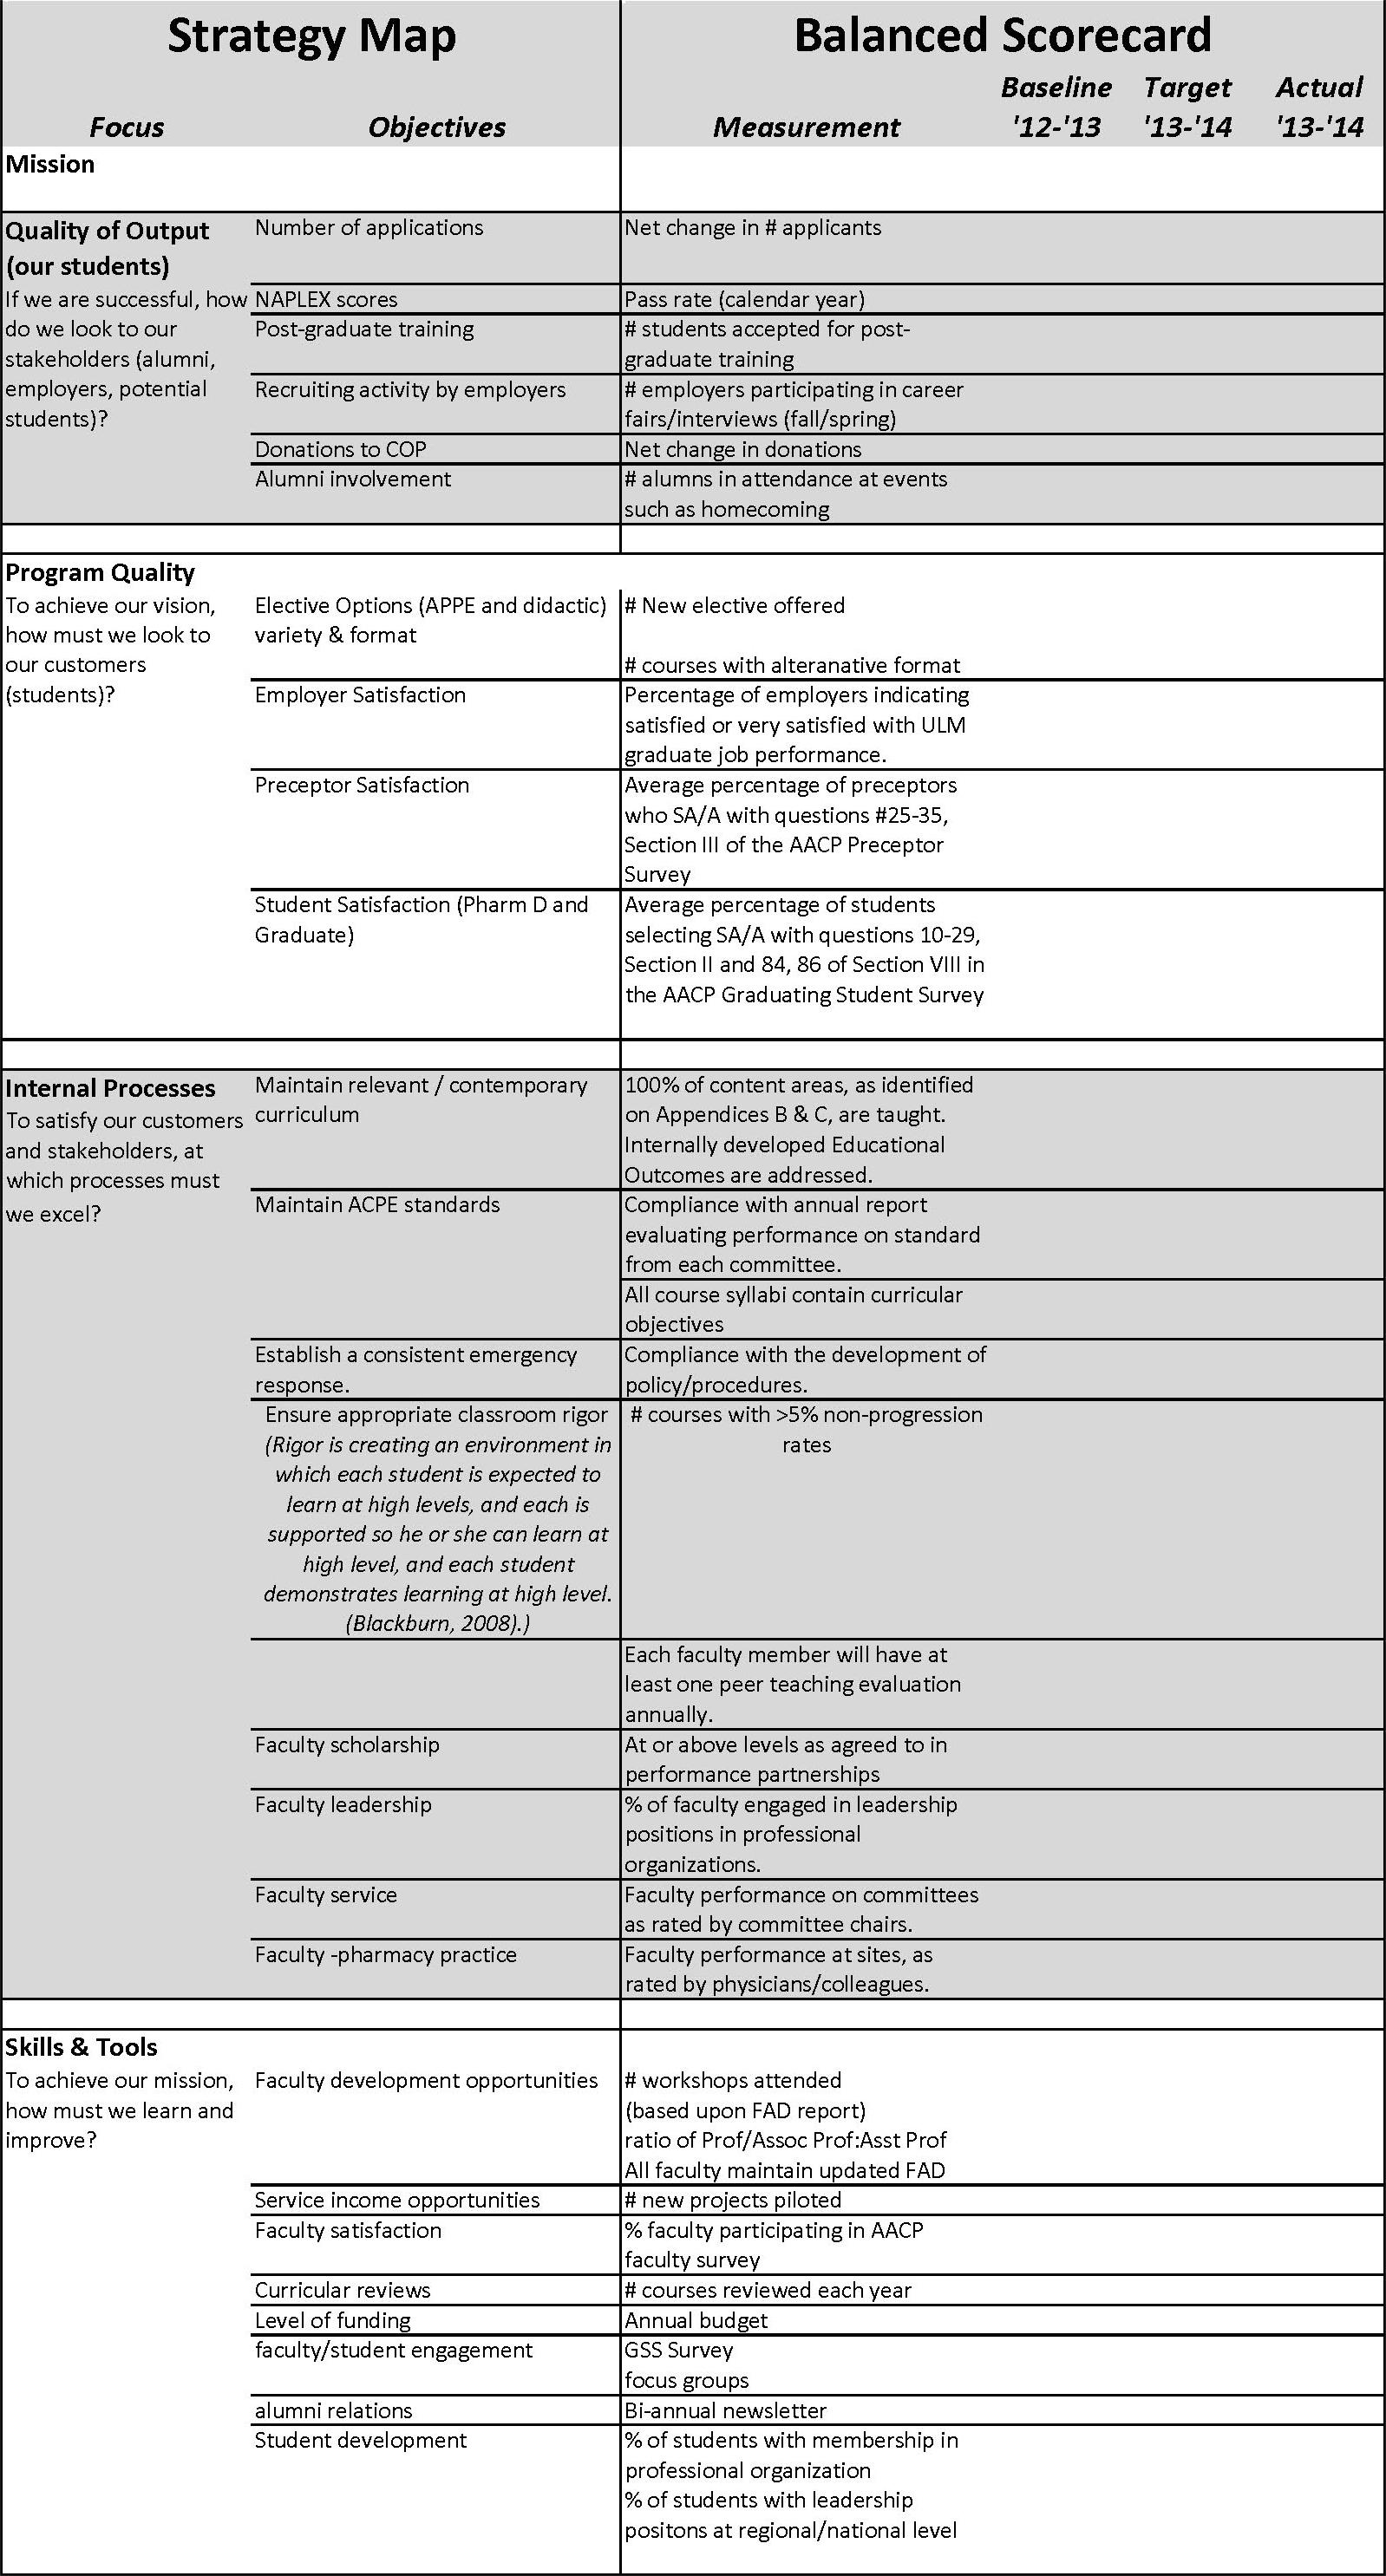 Cop assessment plan ulm university of louisiana at monroe scorecard malvernweather Choice Image